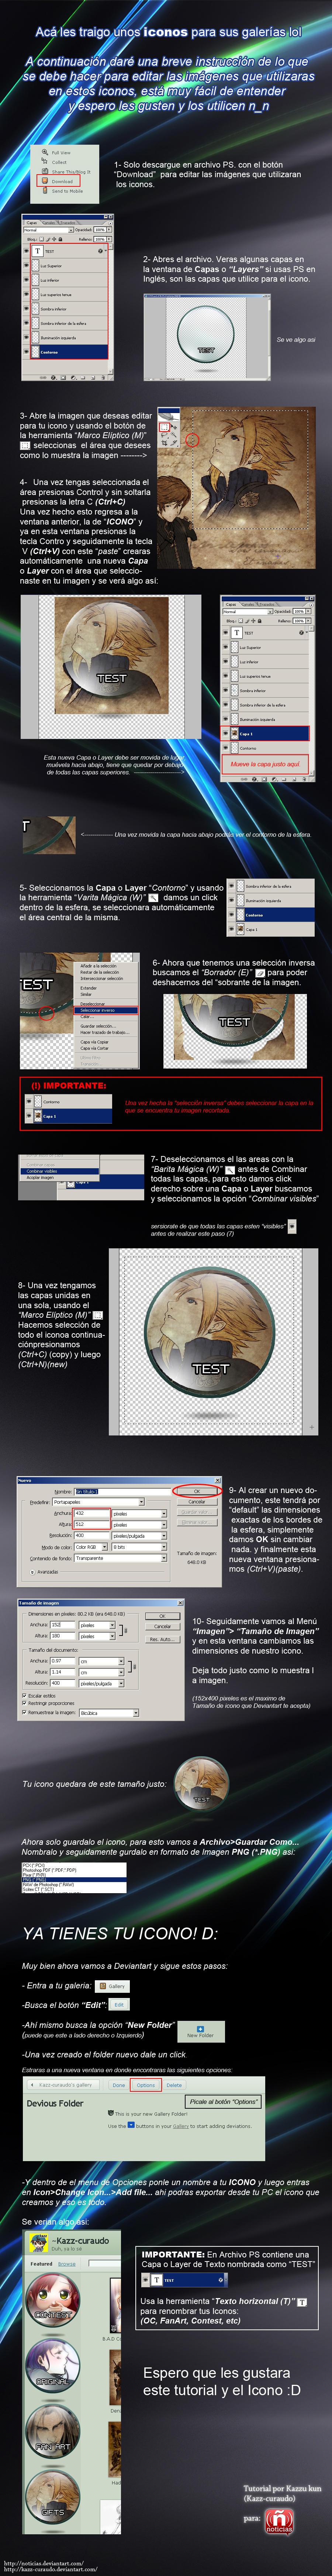 ICON para tu Galeria by Cloudxmoe